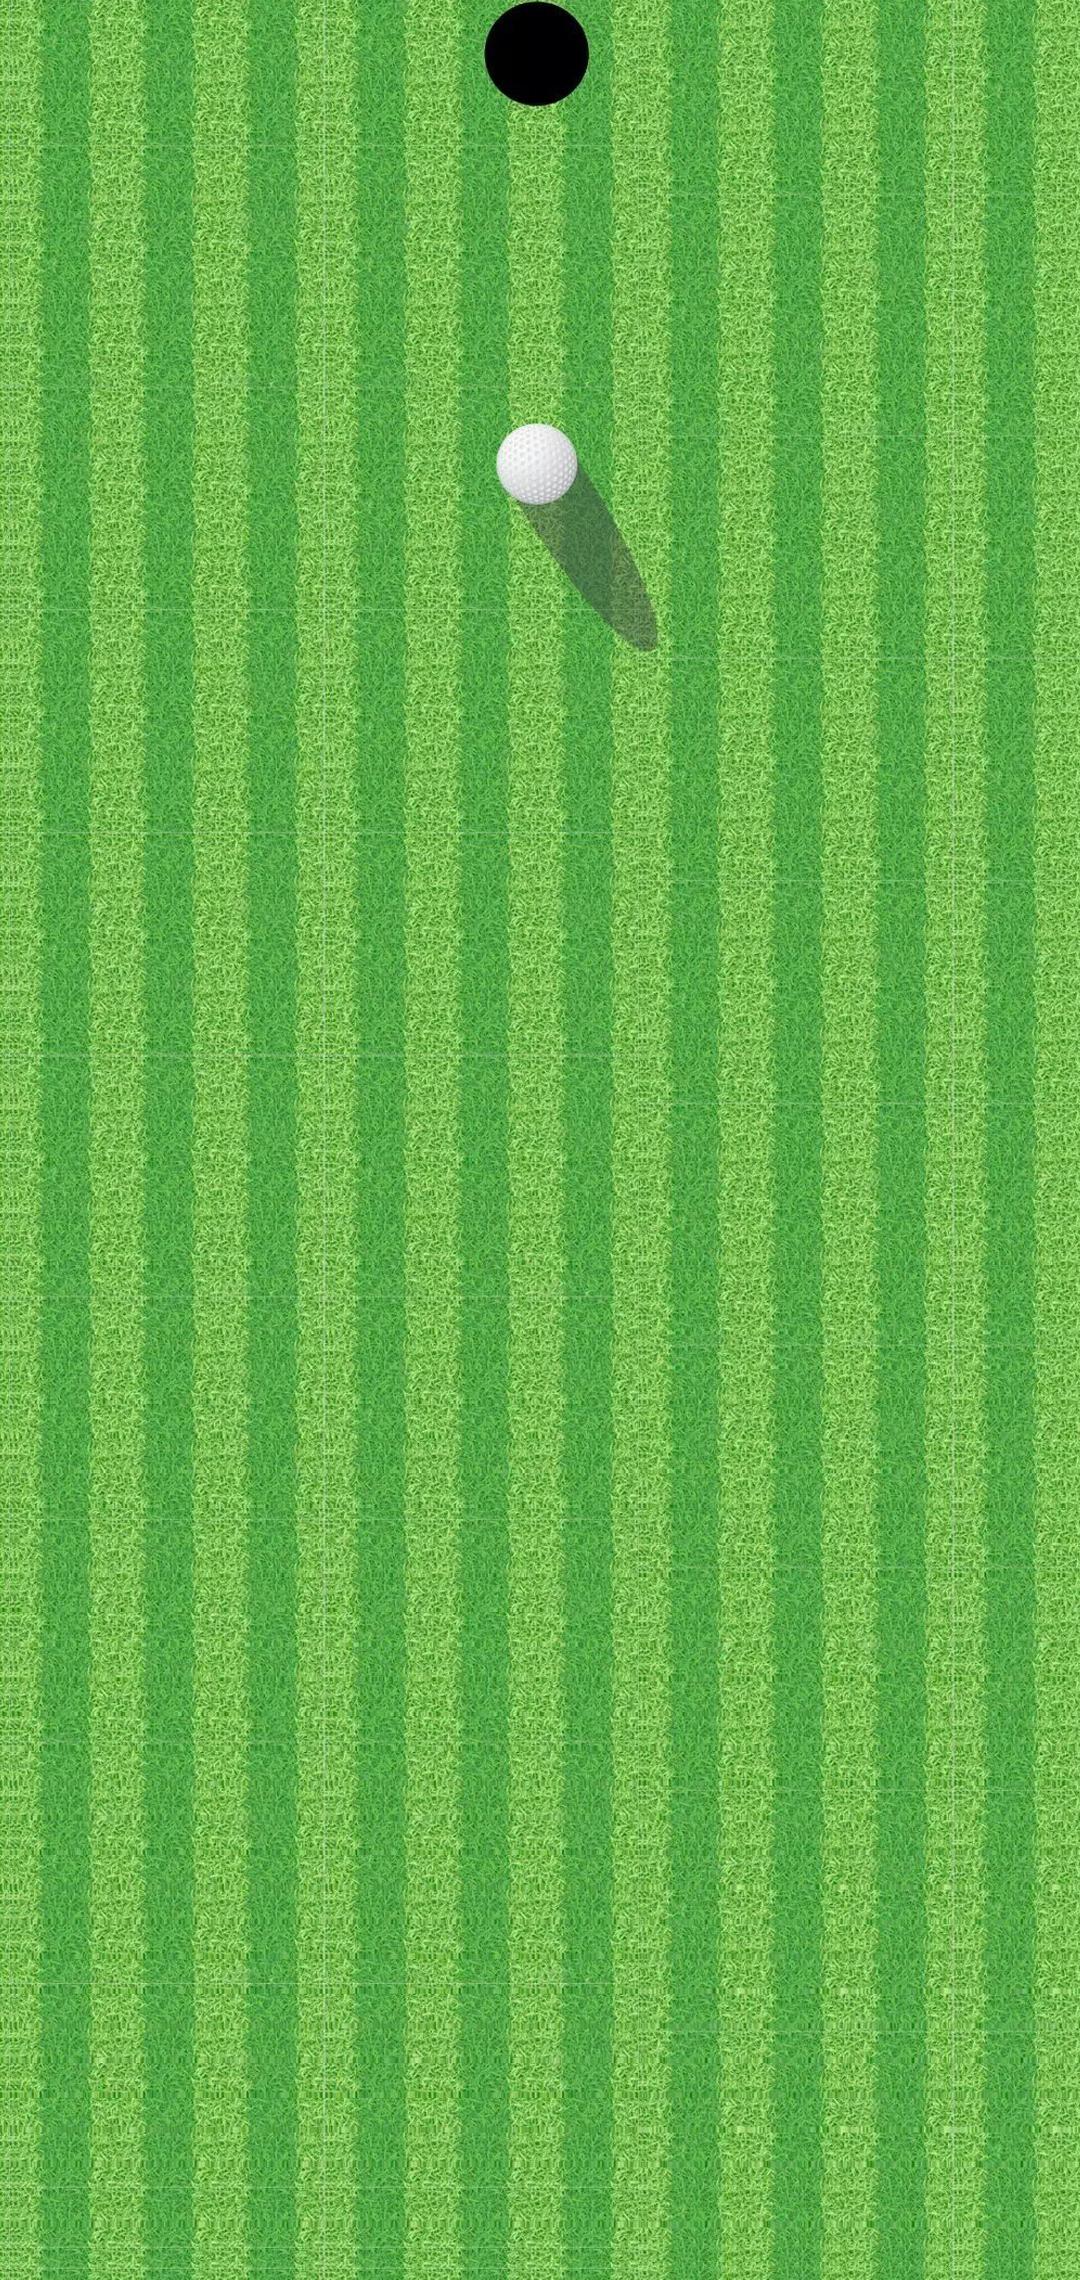 golf pitch camera hole wallpaper